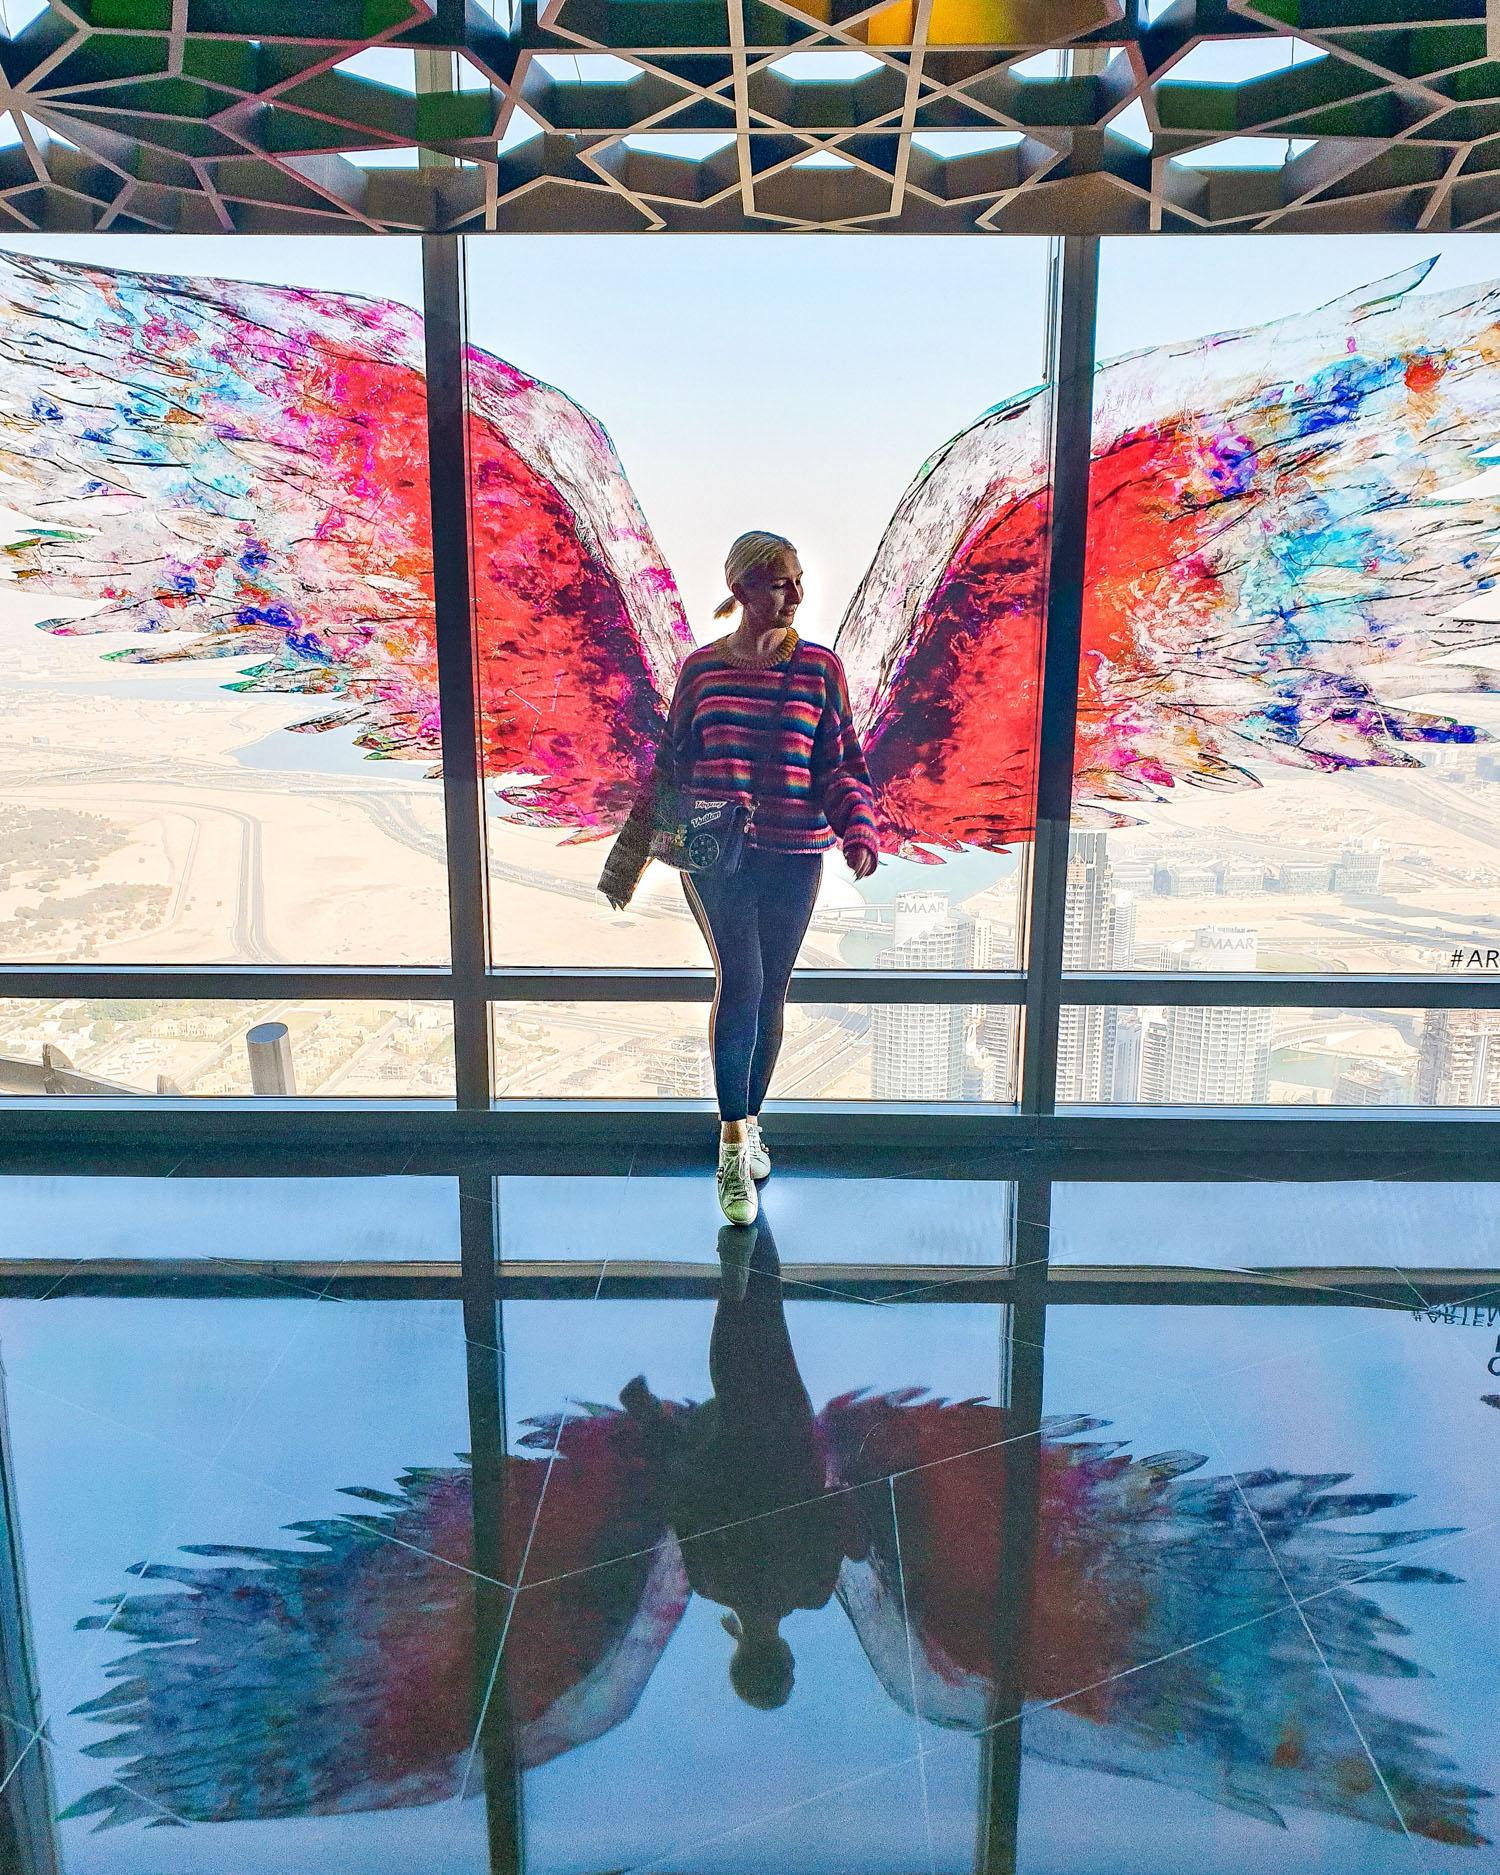 At The Top Burj Khalifa: indoors